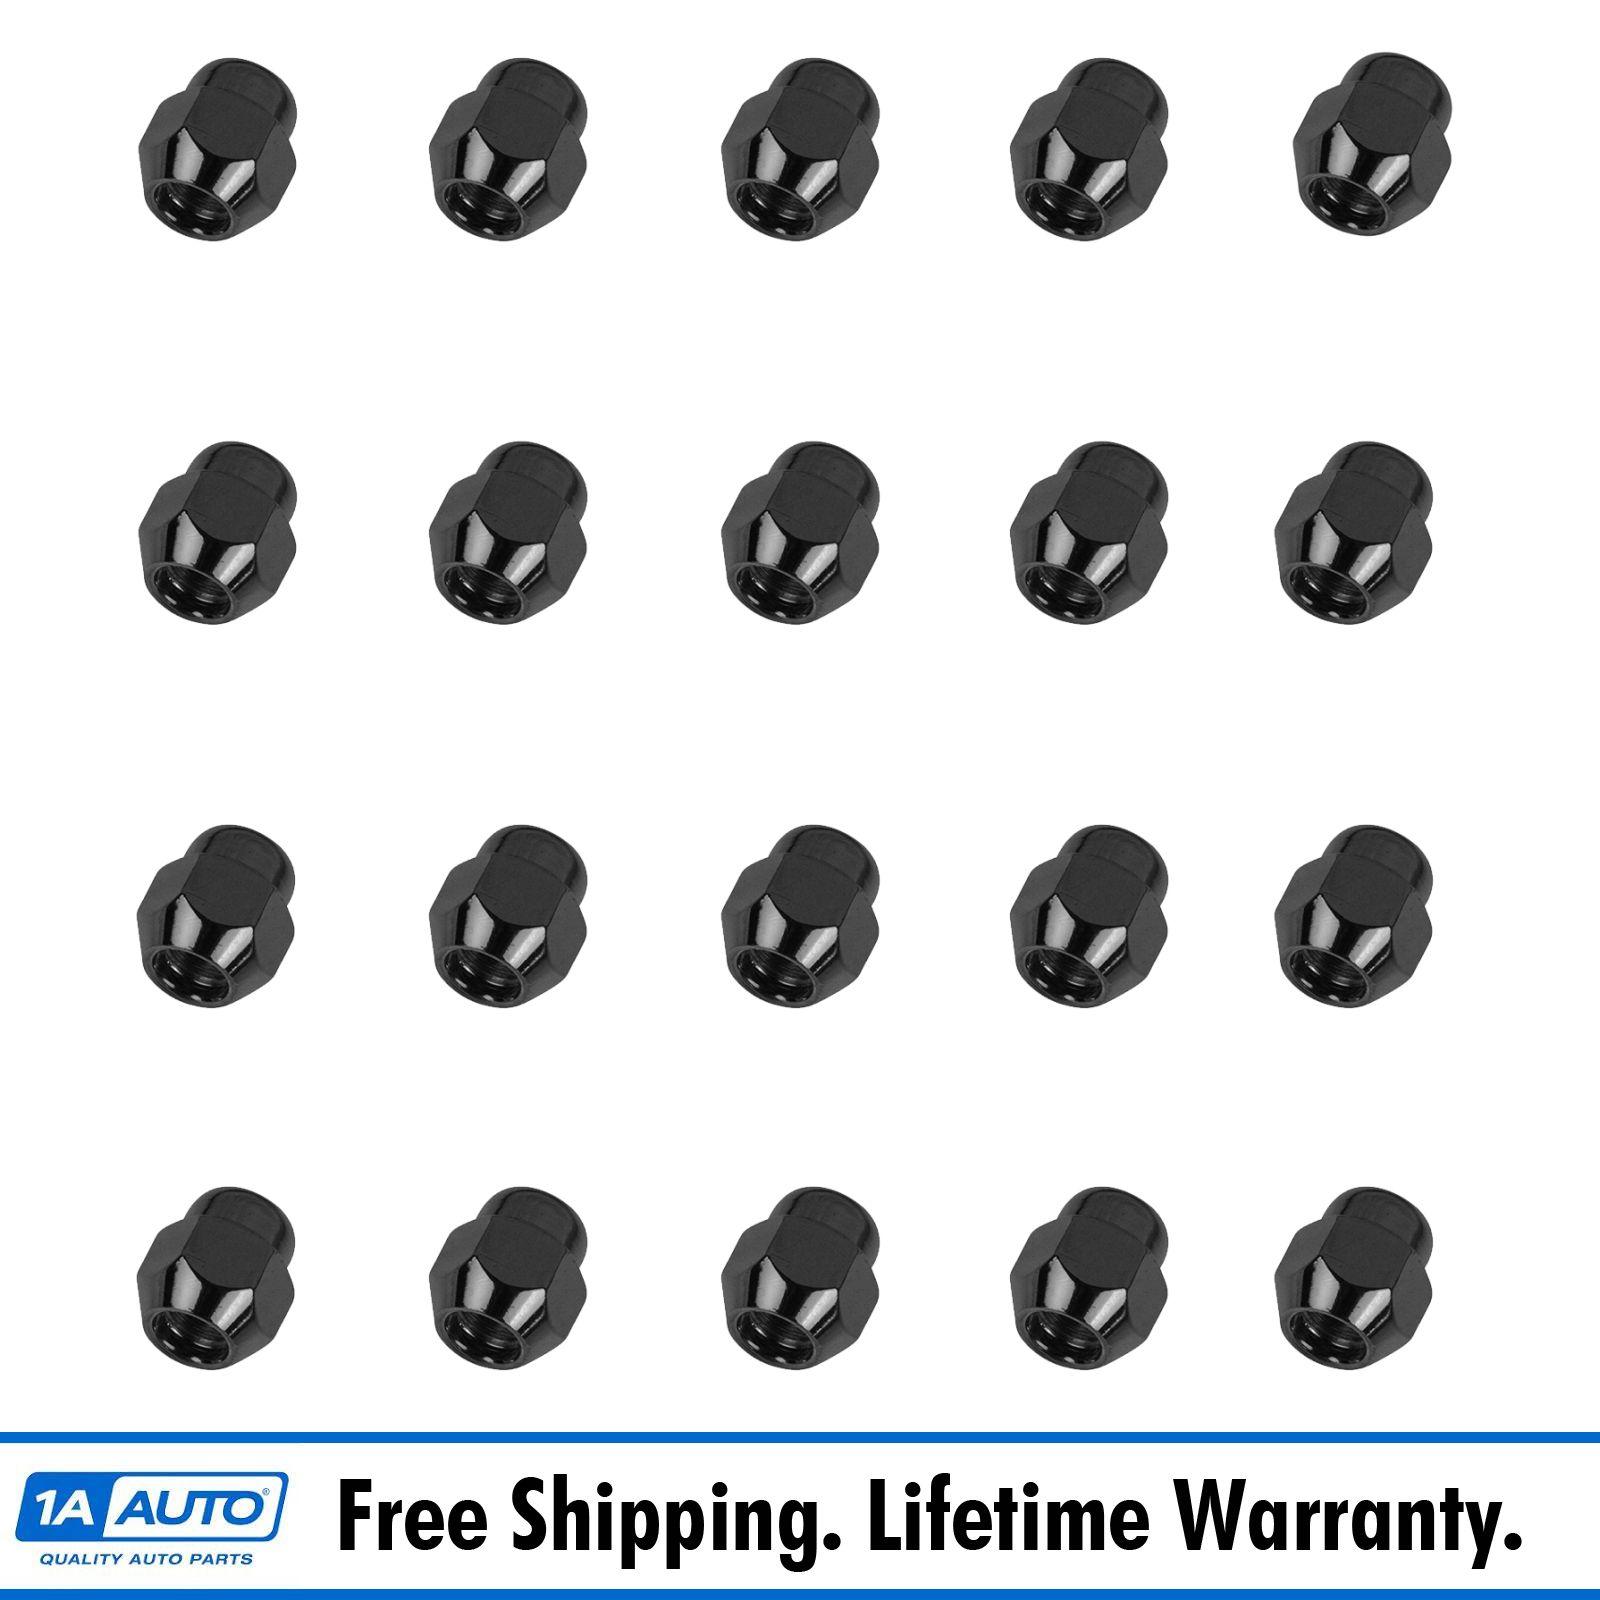 Oem Zn50a Wheel Lug Nut Chrome Acorn Style Set Of 20